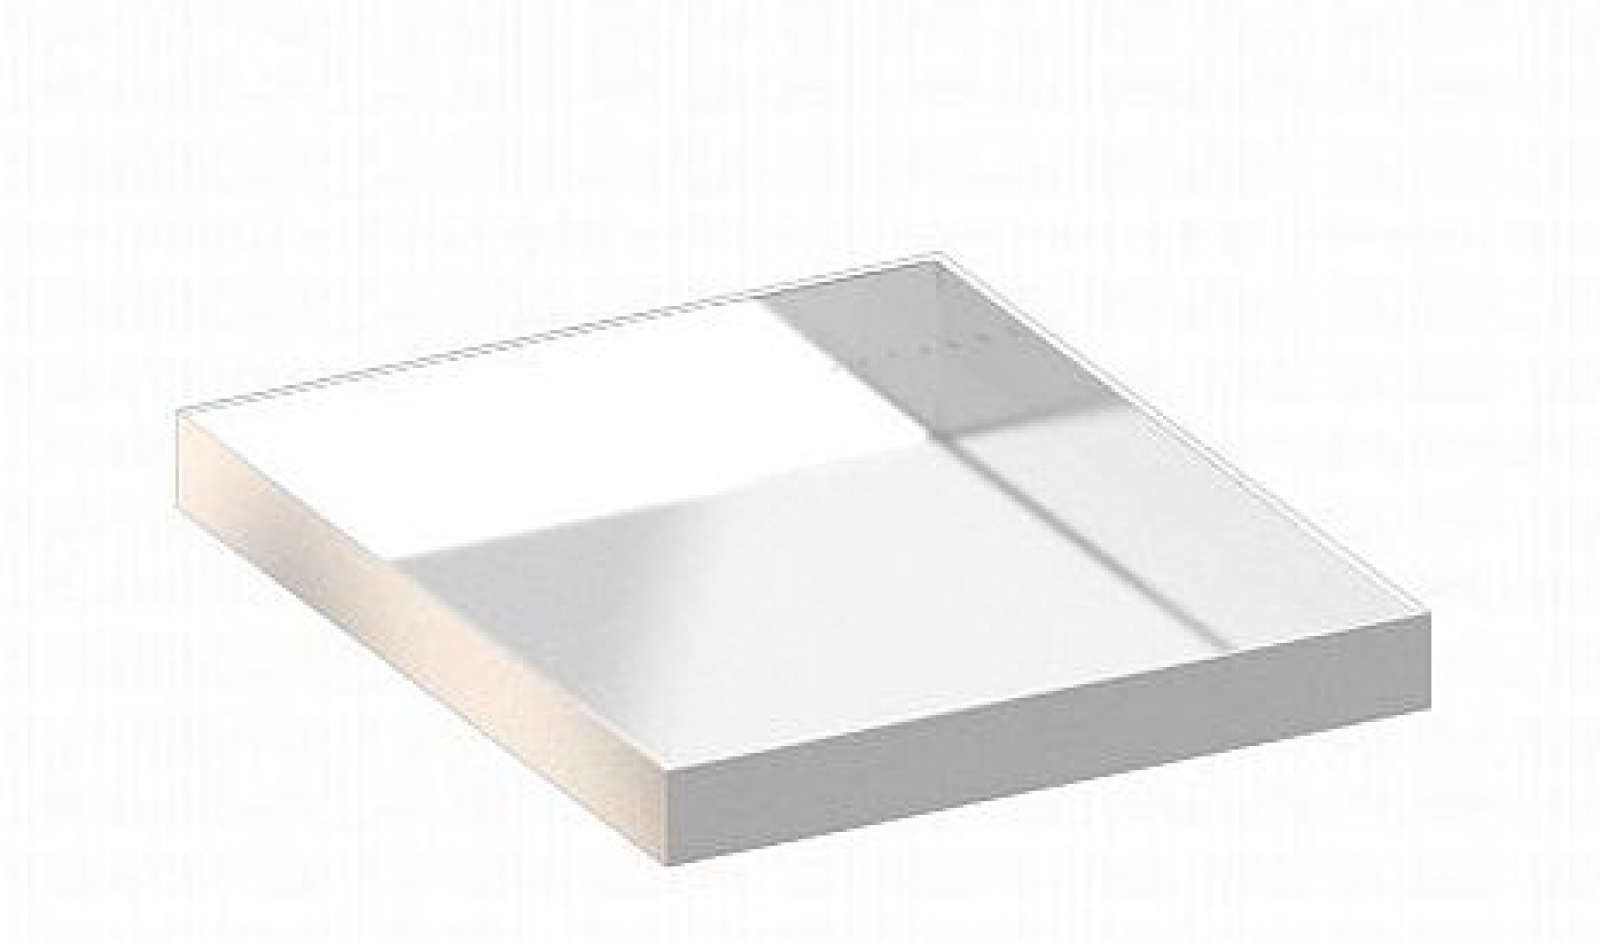 binto m lltonnenbox einzelkomponente pflanzschale edelstahl links rechts solo. Black Bedroom Furniture Sets. Home Design Ideas